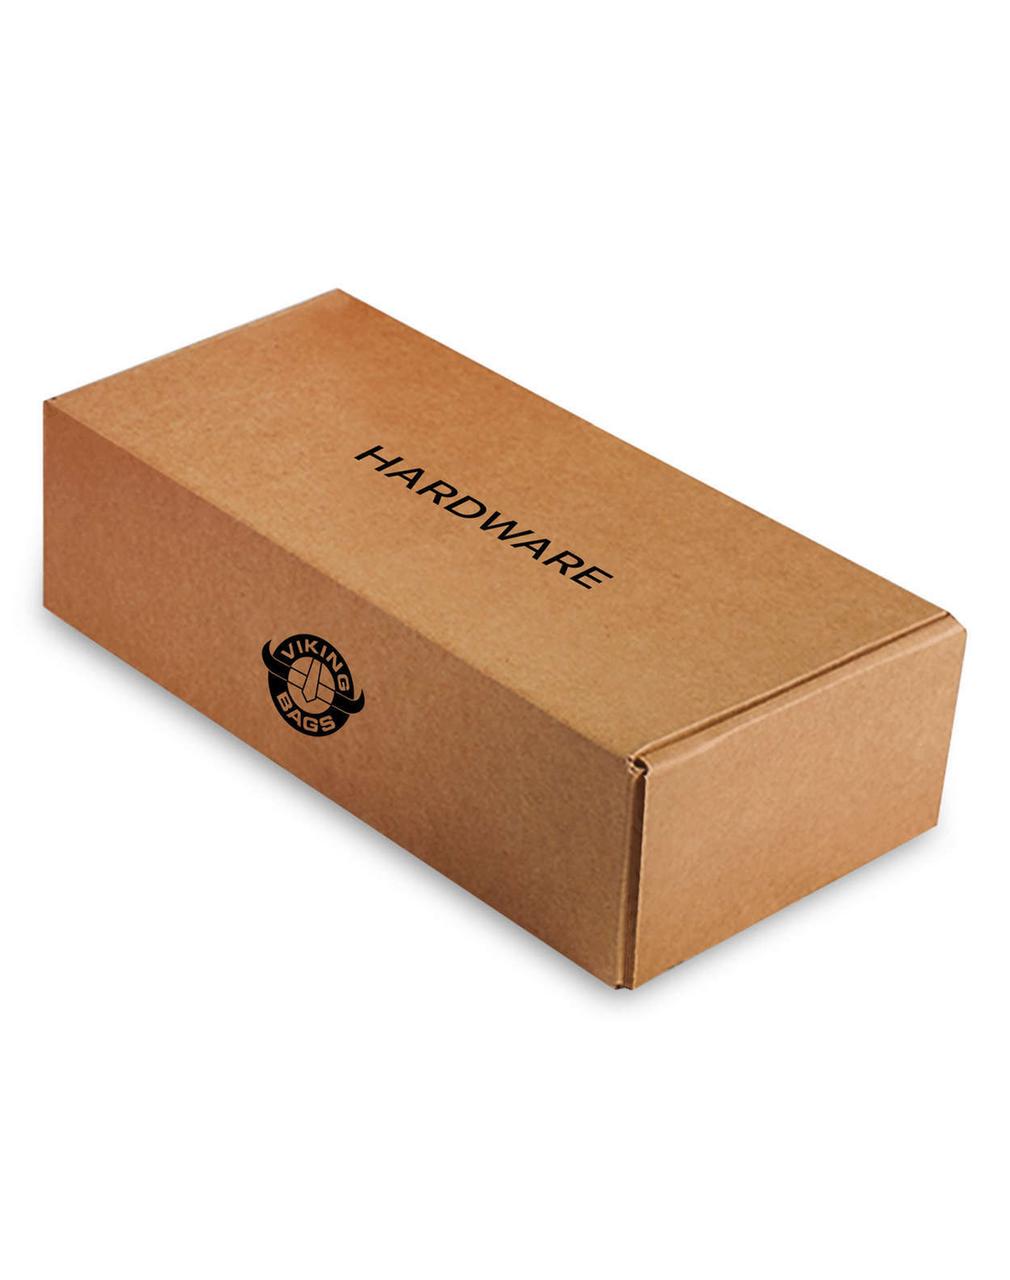 Honda 1500 Valkyrie Standard Pinnacle Studded Motorcycle saddlebags Box